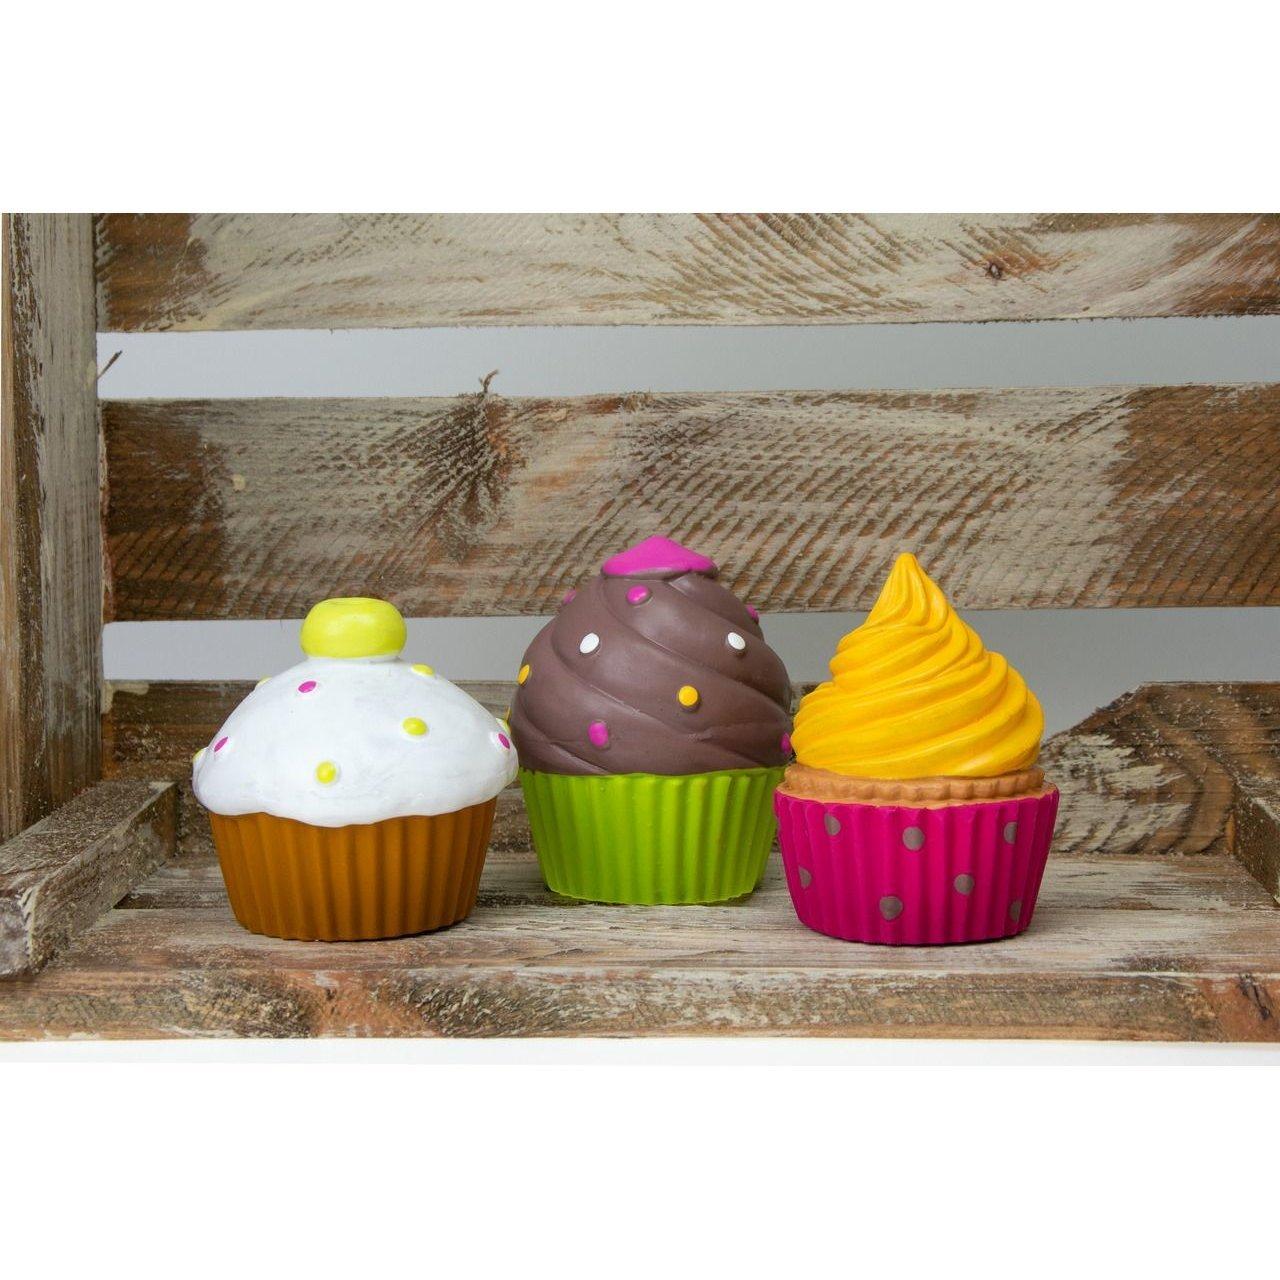 Karlie Hundespielzeug Cupcakes mit Squeaker, Cupcake, 9 x 9 x 9 cm